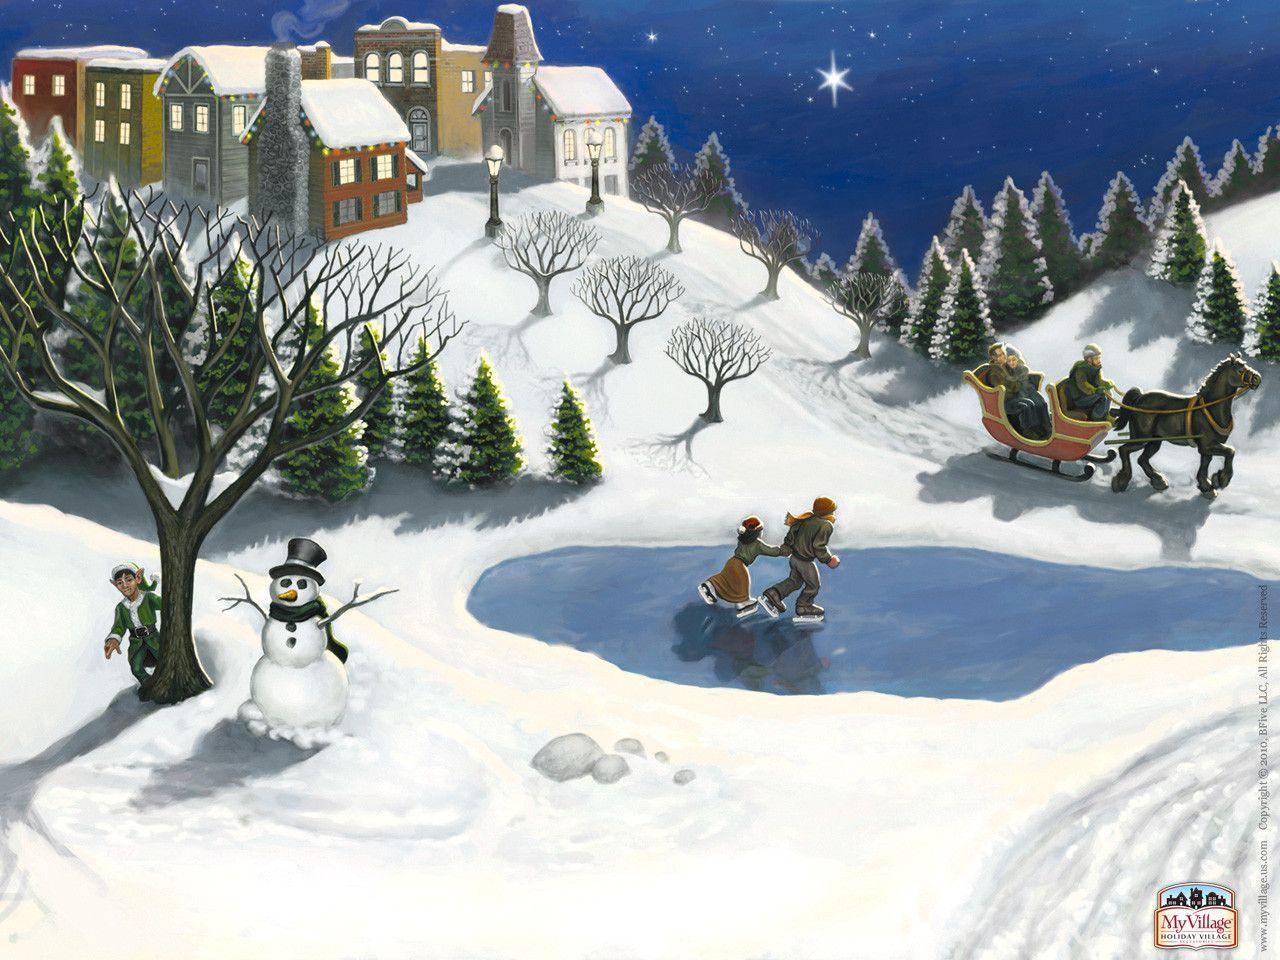 Christmas Village Backgrounds 1280x960